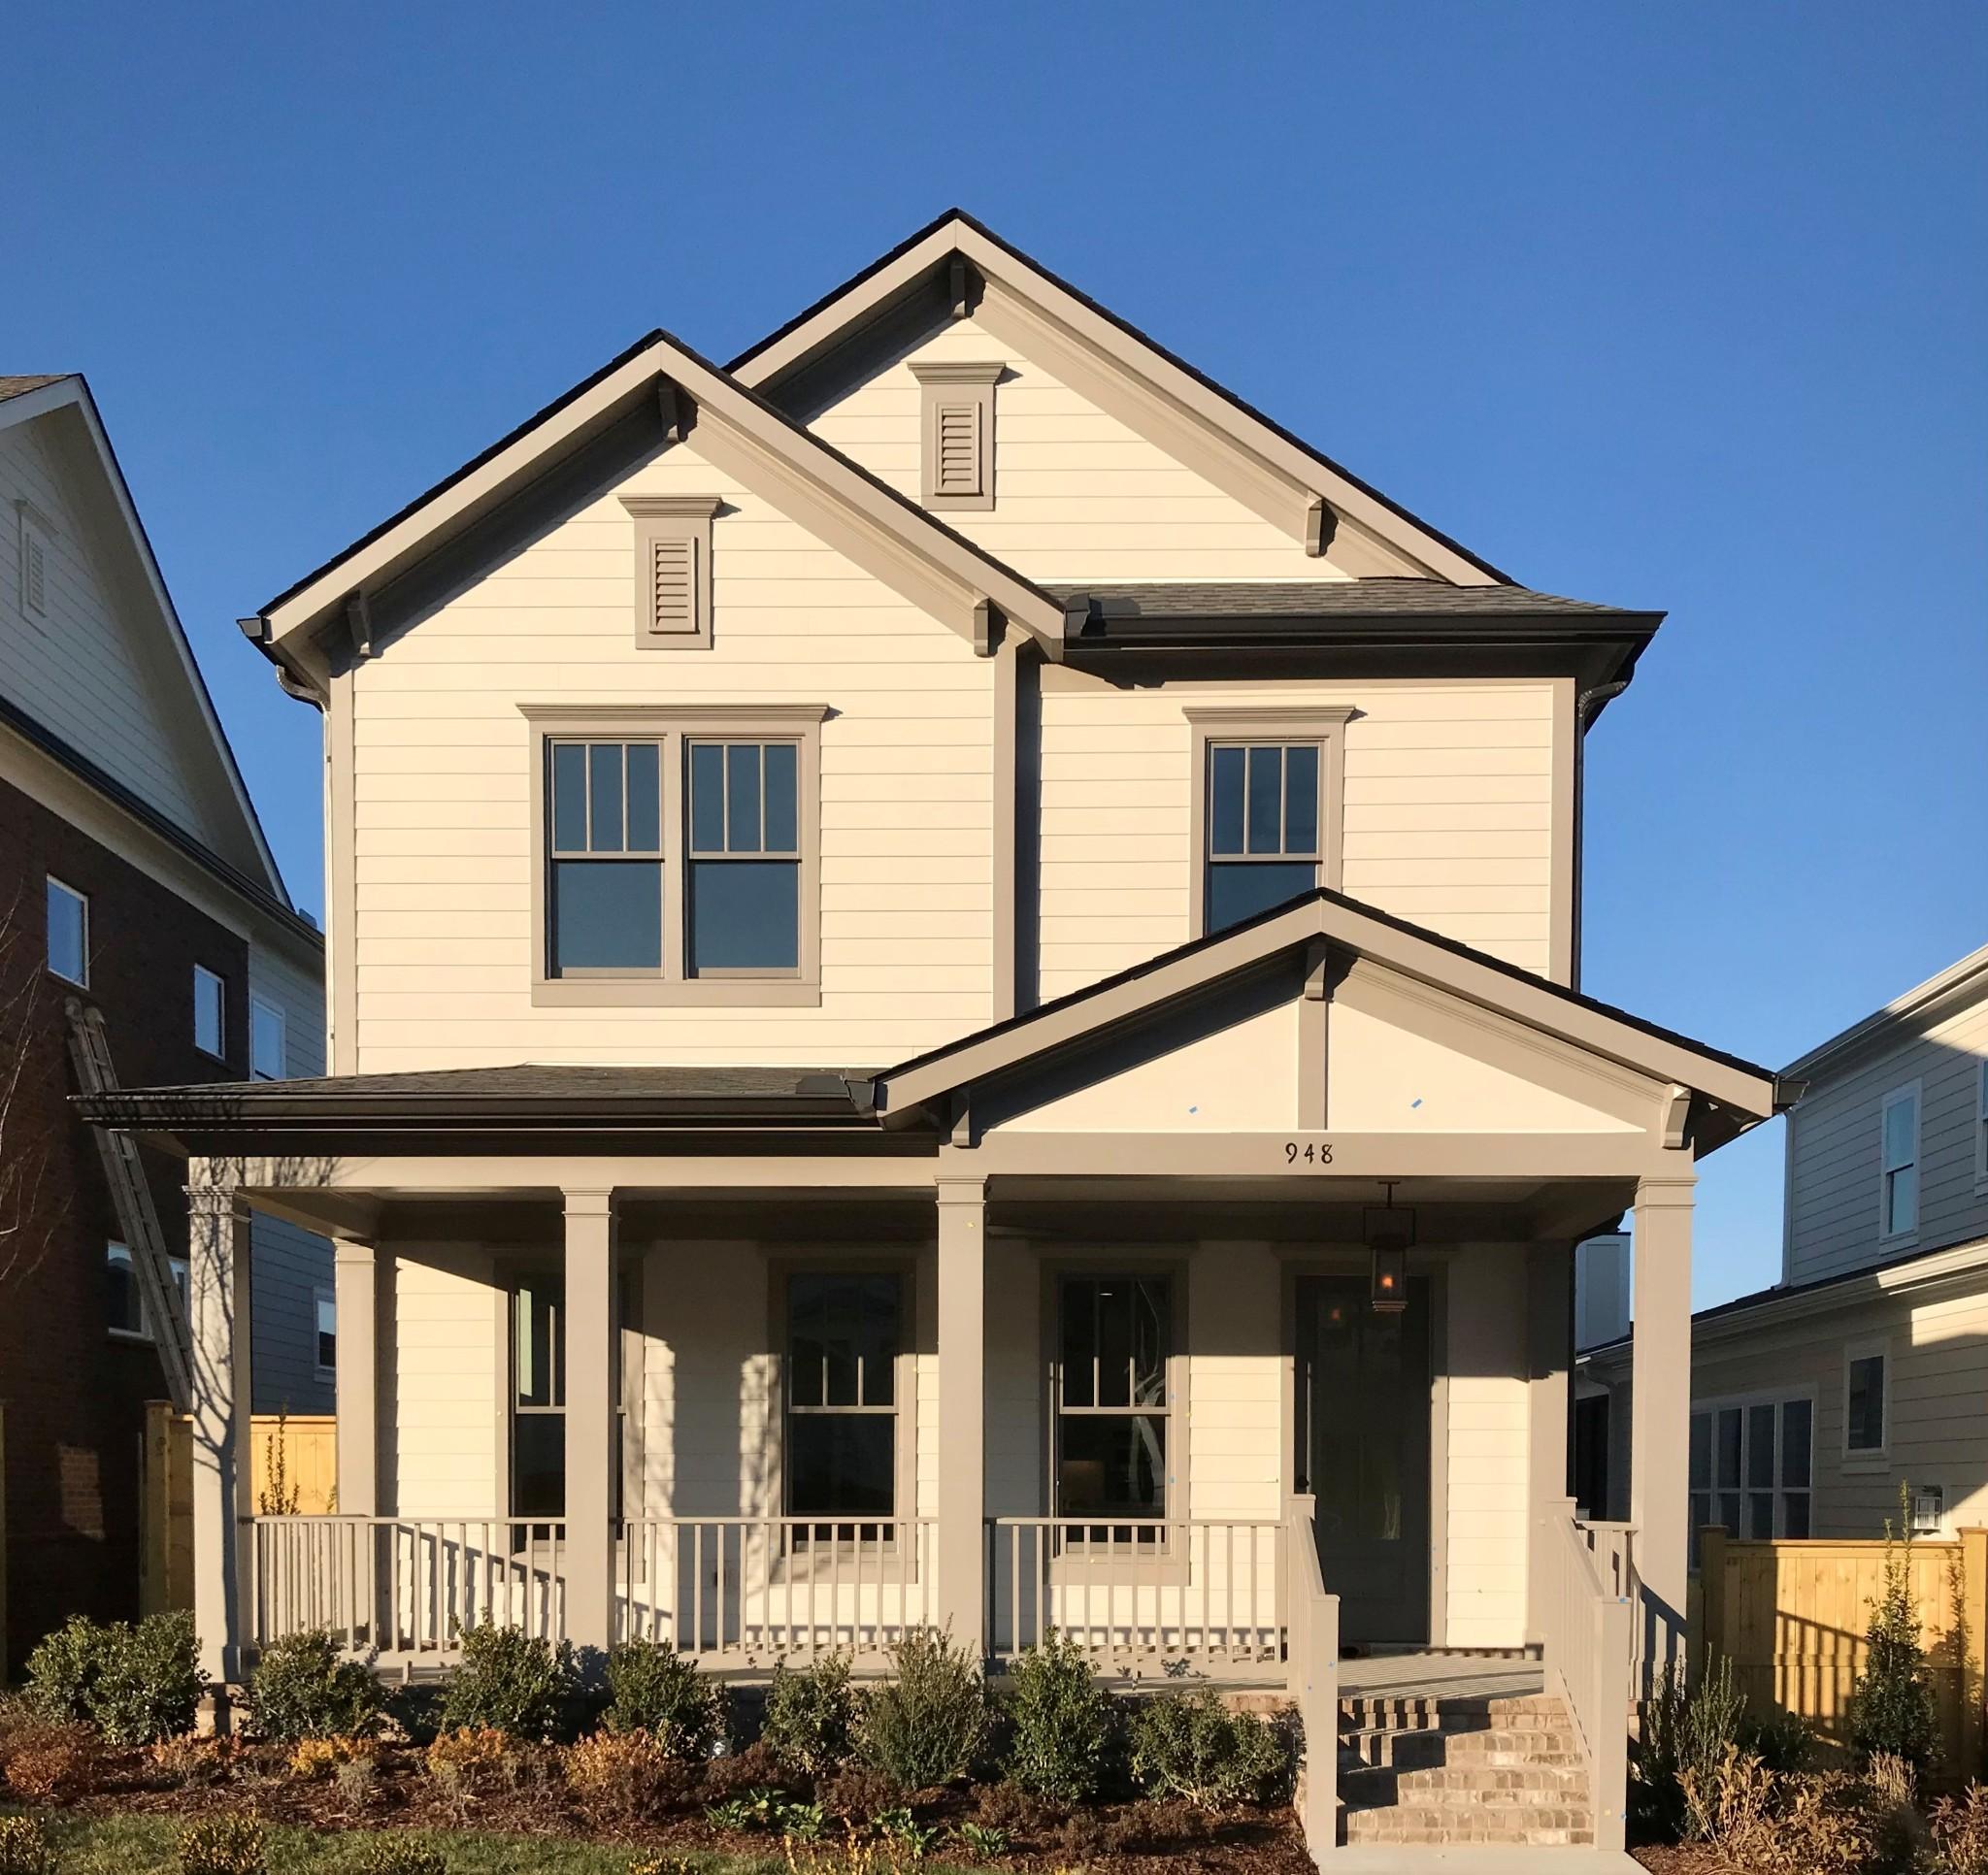 948 Cheltenham Ave, Wh # 2132 Property Photo